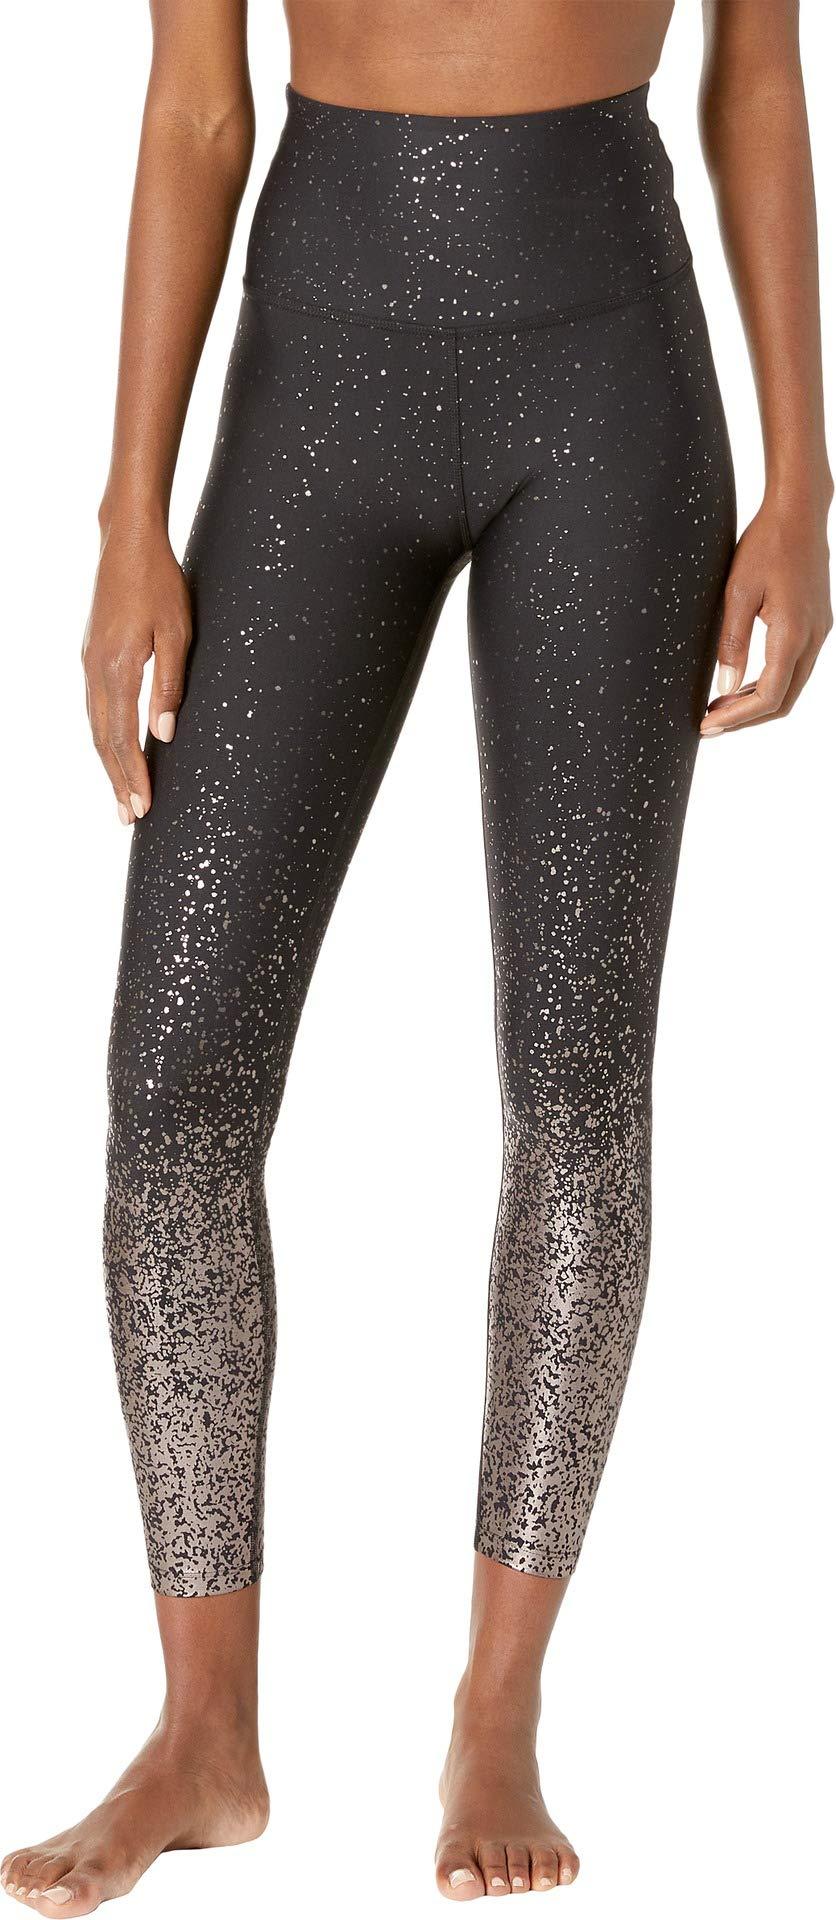 Beyond Yoga Alloy Ombre Sport Flex High Waist Midi Legging, Black Gunmetal Speckle, Small